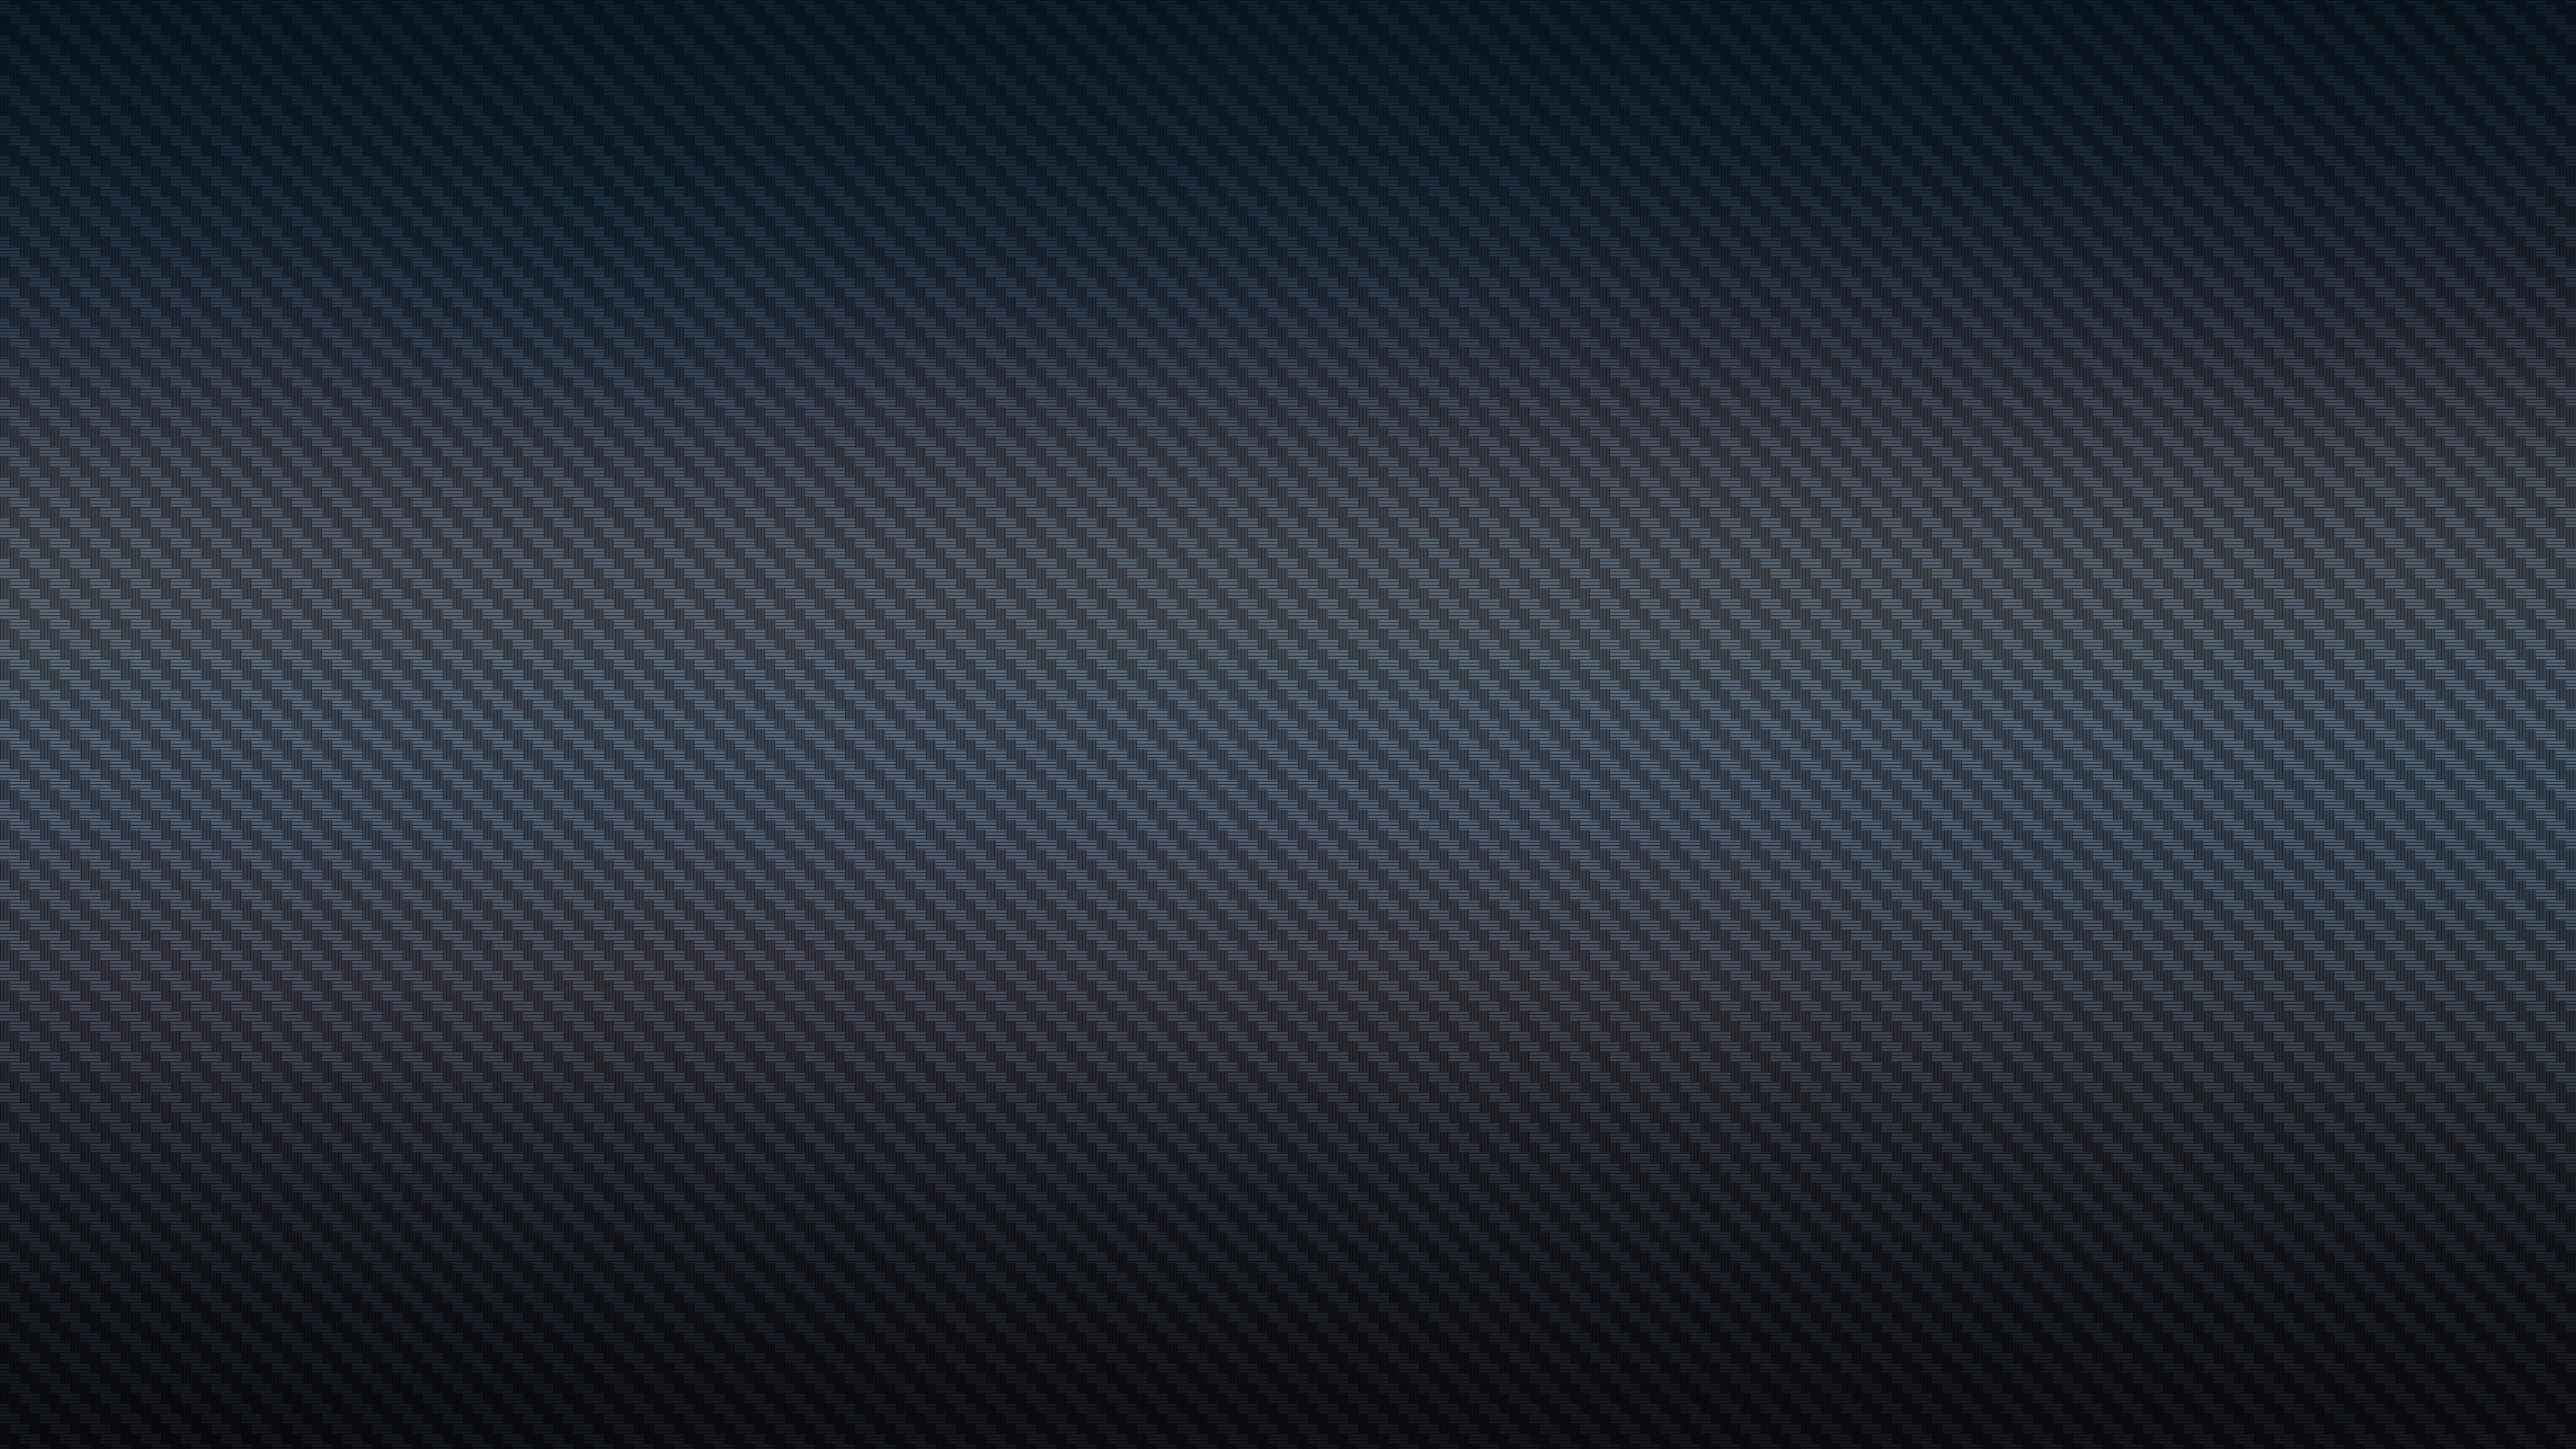 1600x900 Dark Abstract Pattern 4k 1600x900 Resolution Hd 4k